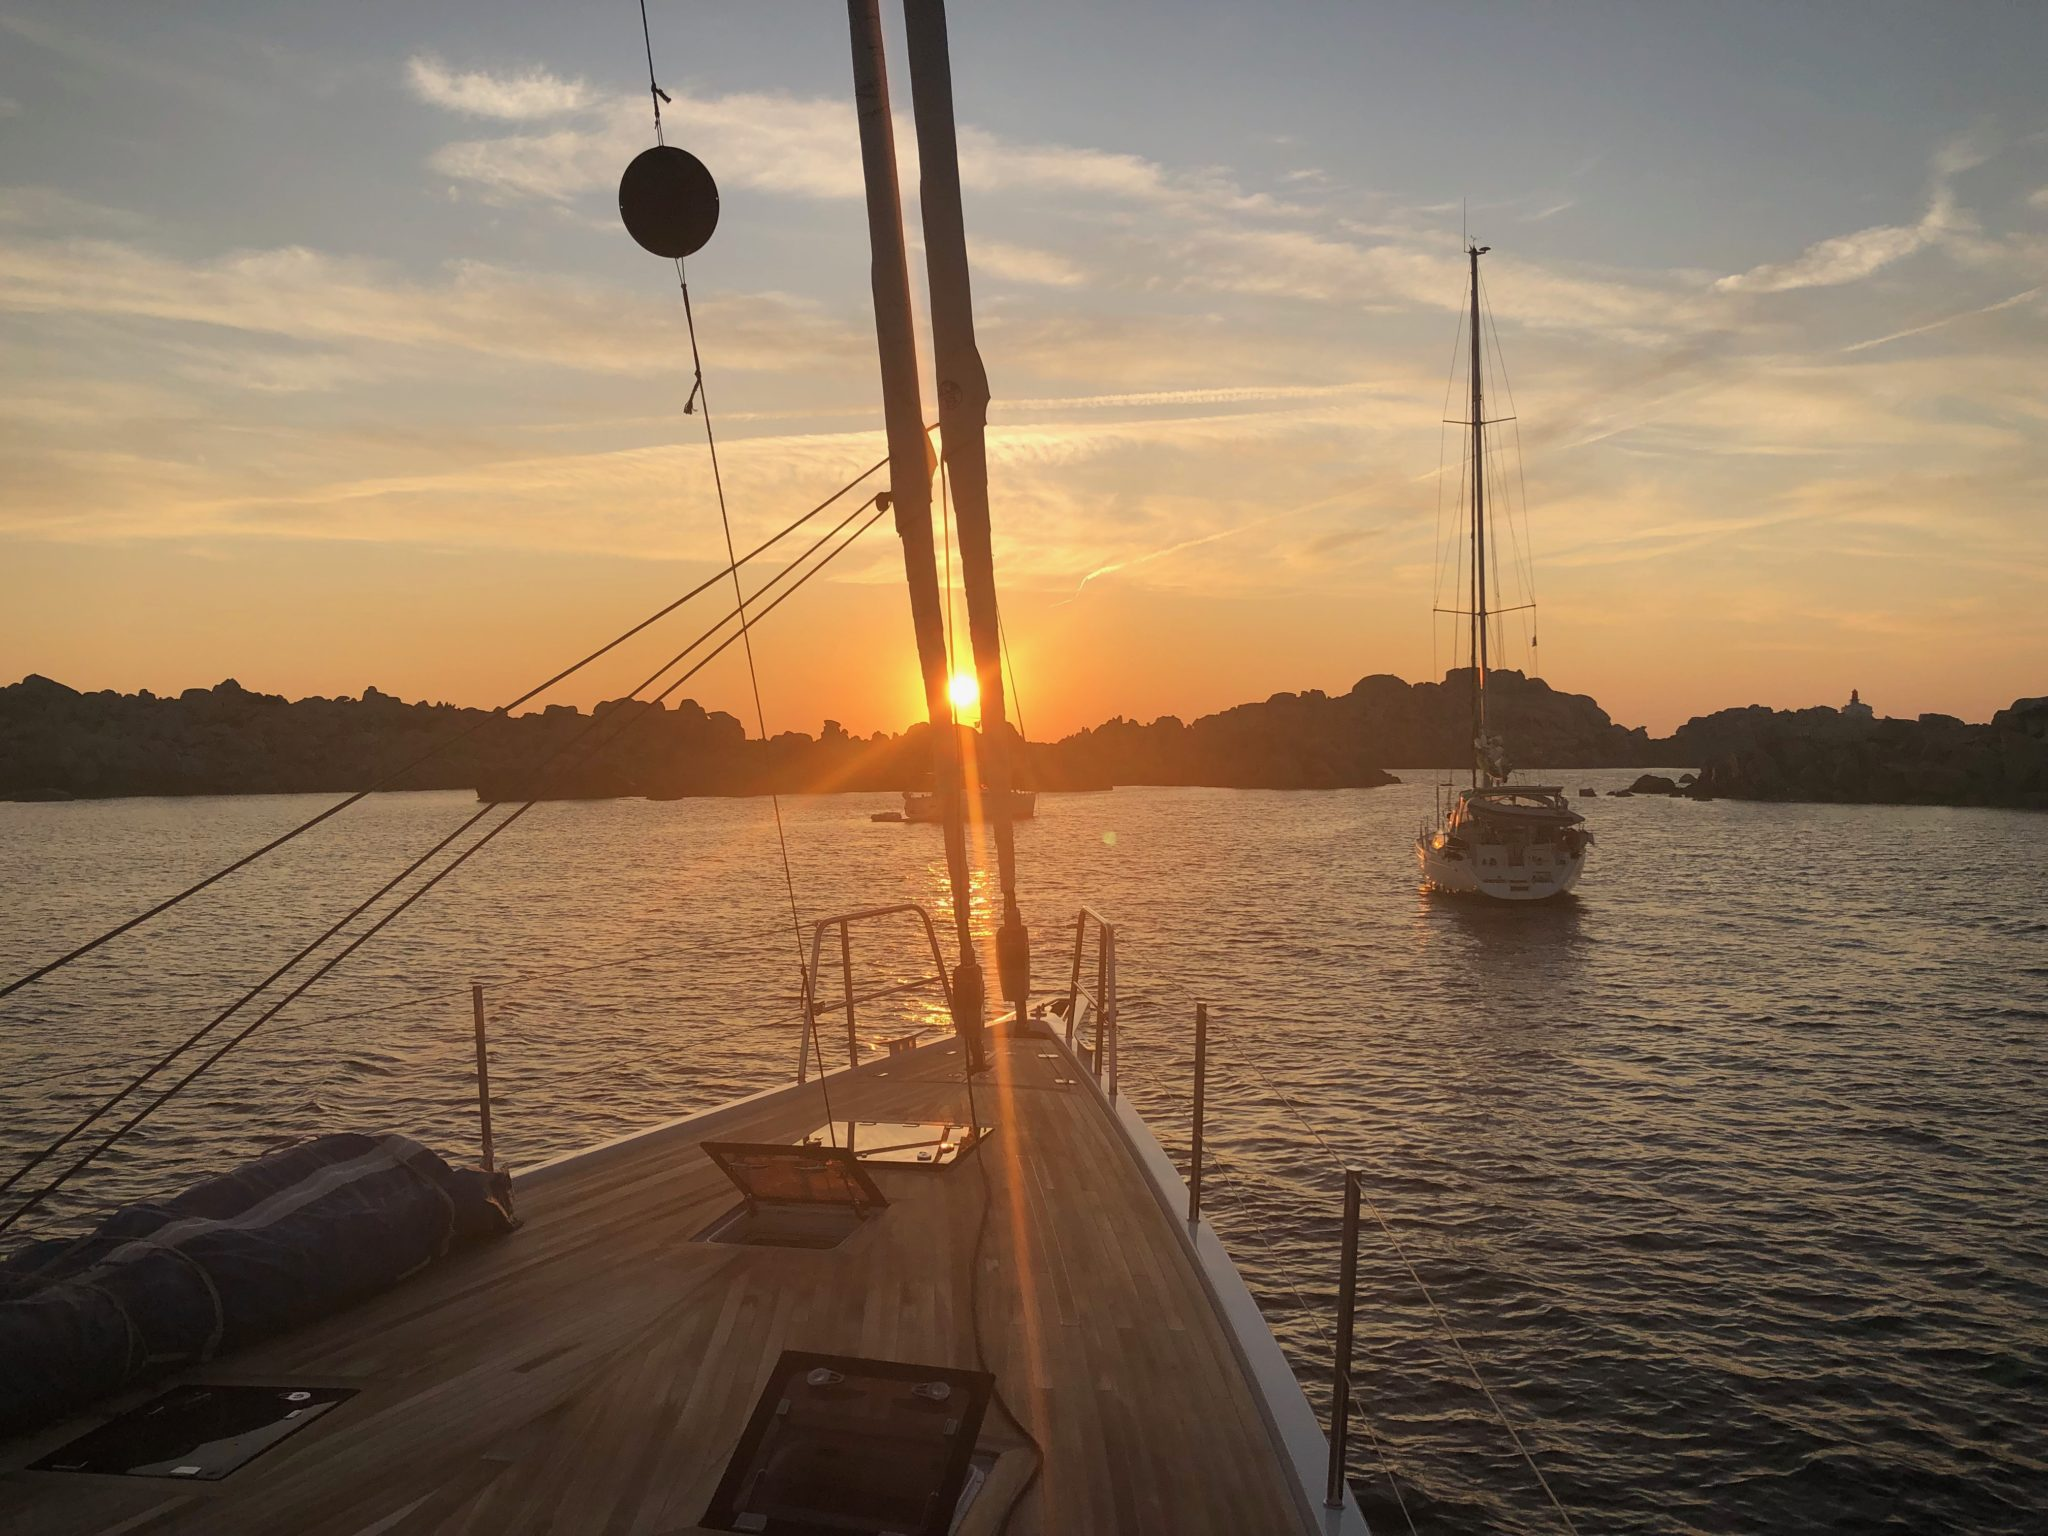 Sunsetting on Summer 2019